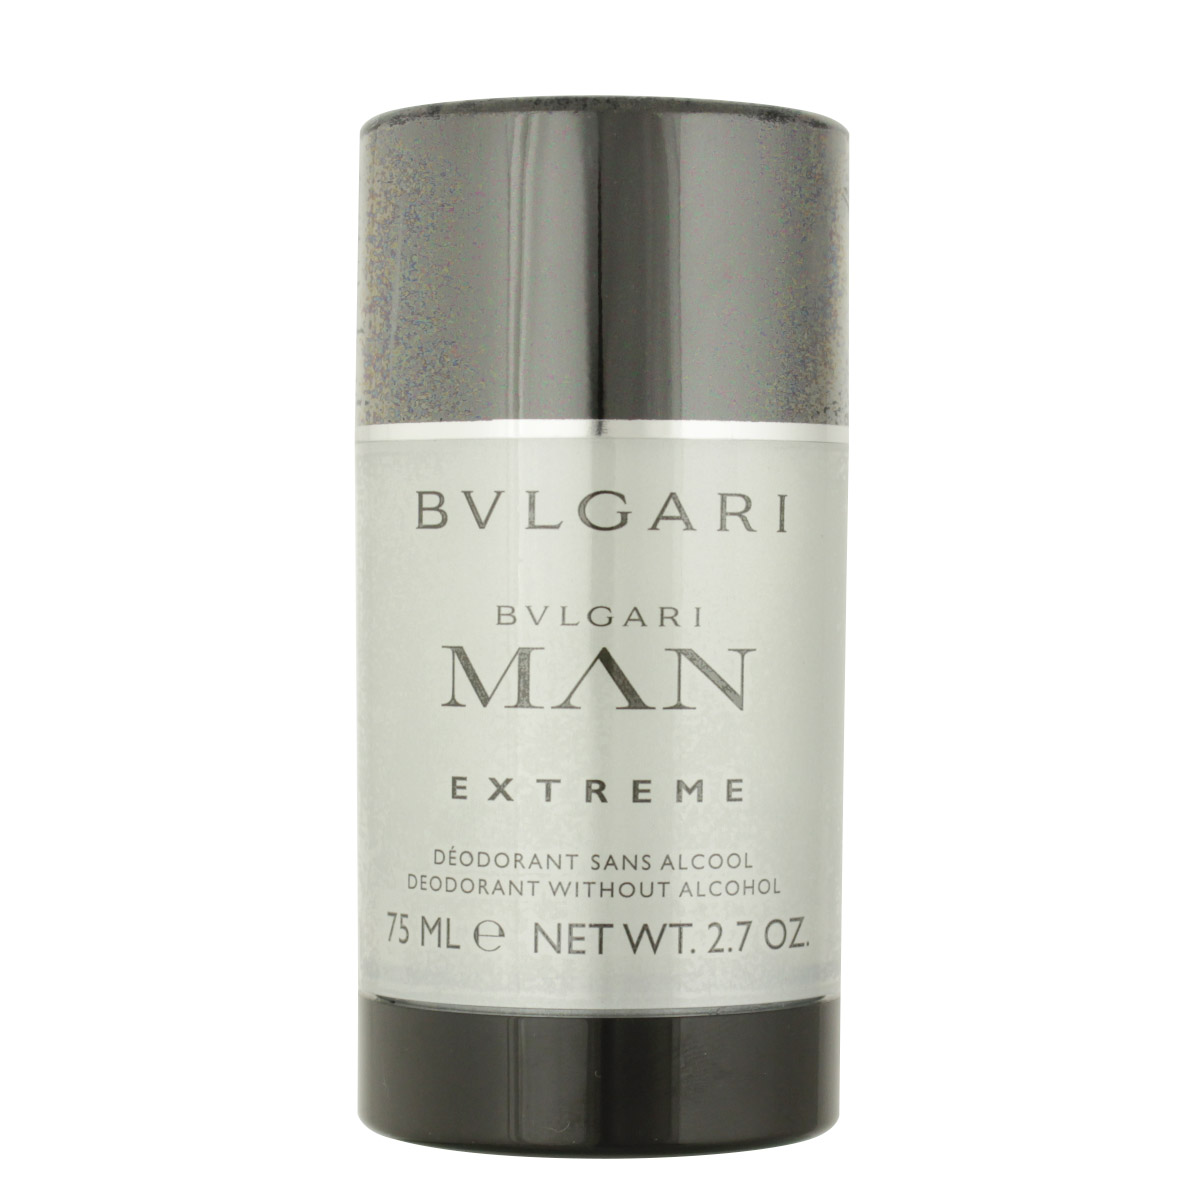 Bvlgari Man Extreme DST 75 ml M